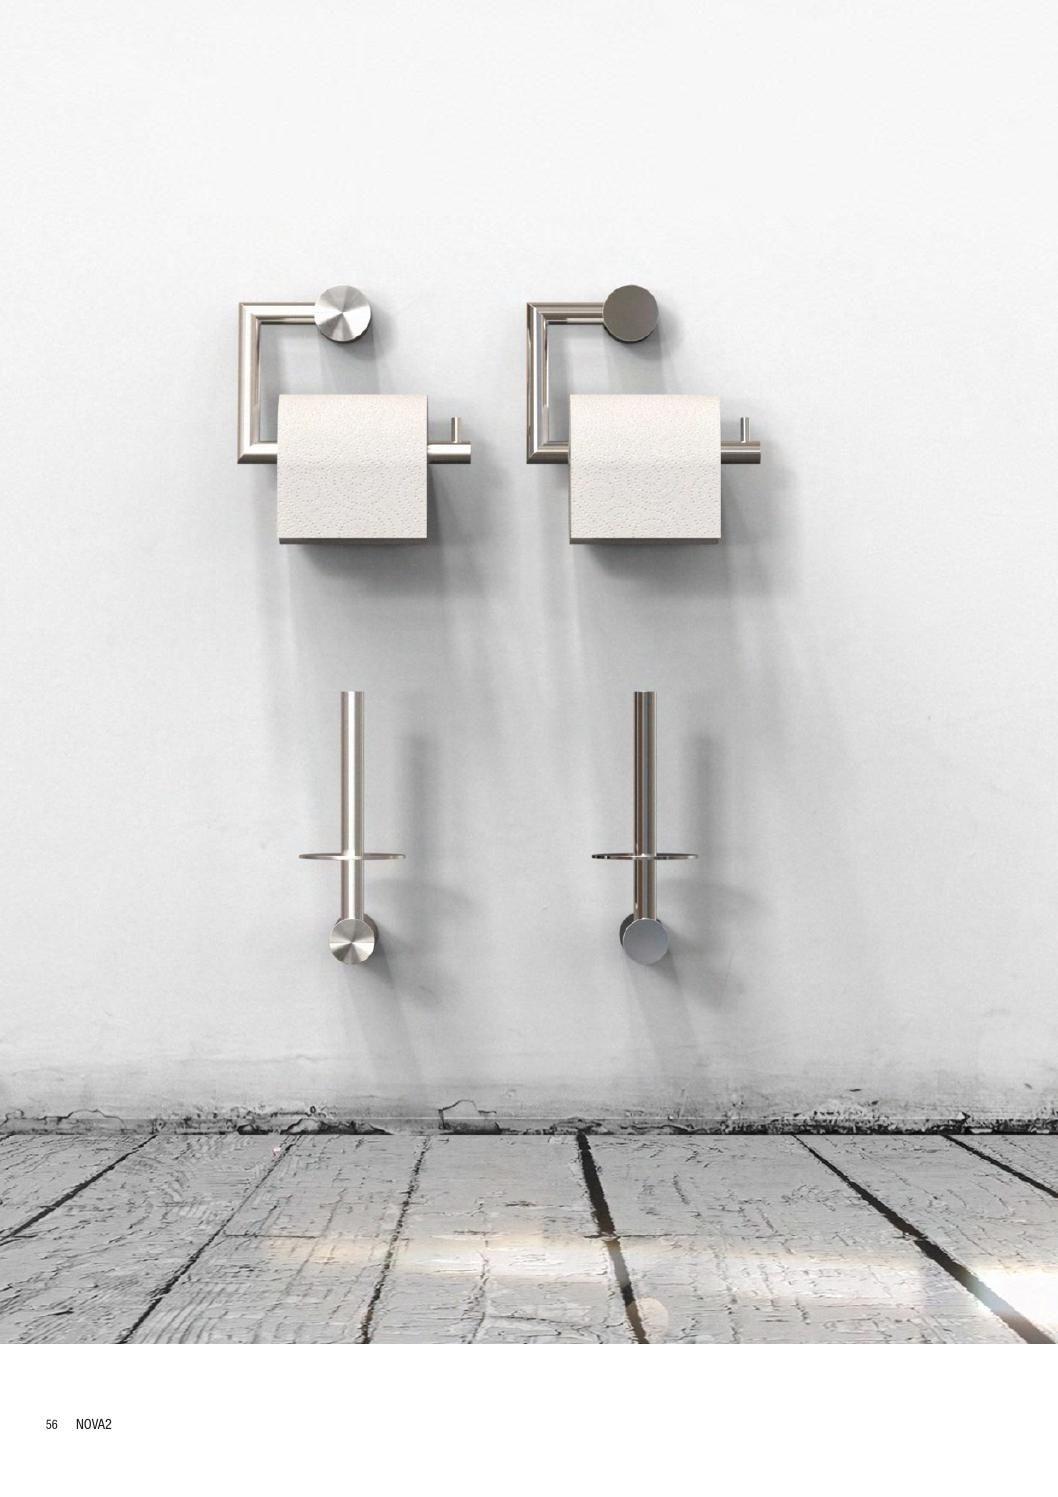 Frost nova2 #bathroom #accessories   FROST NOVA2 Collection ...